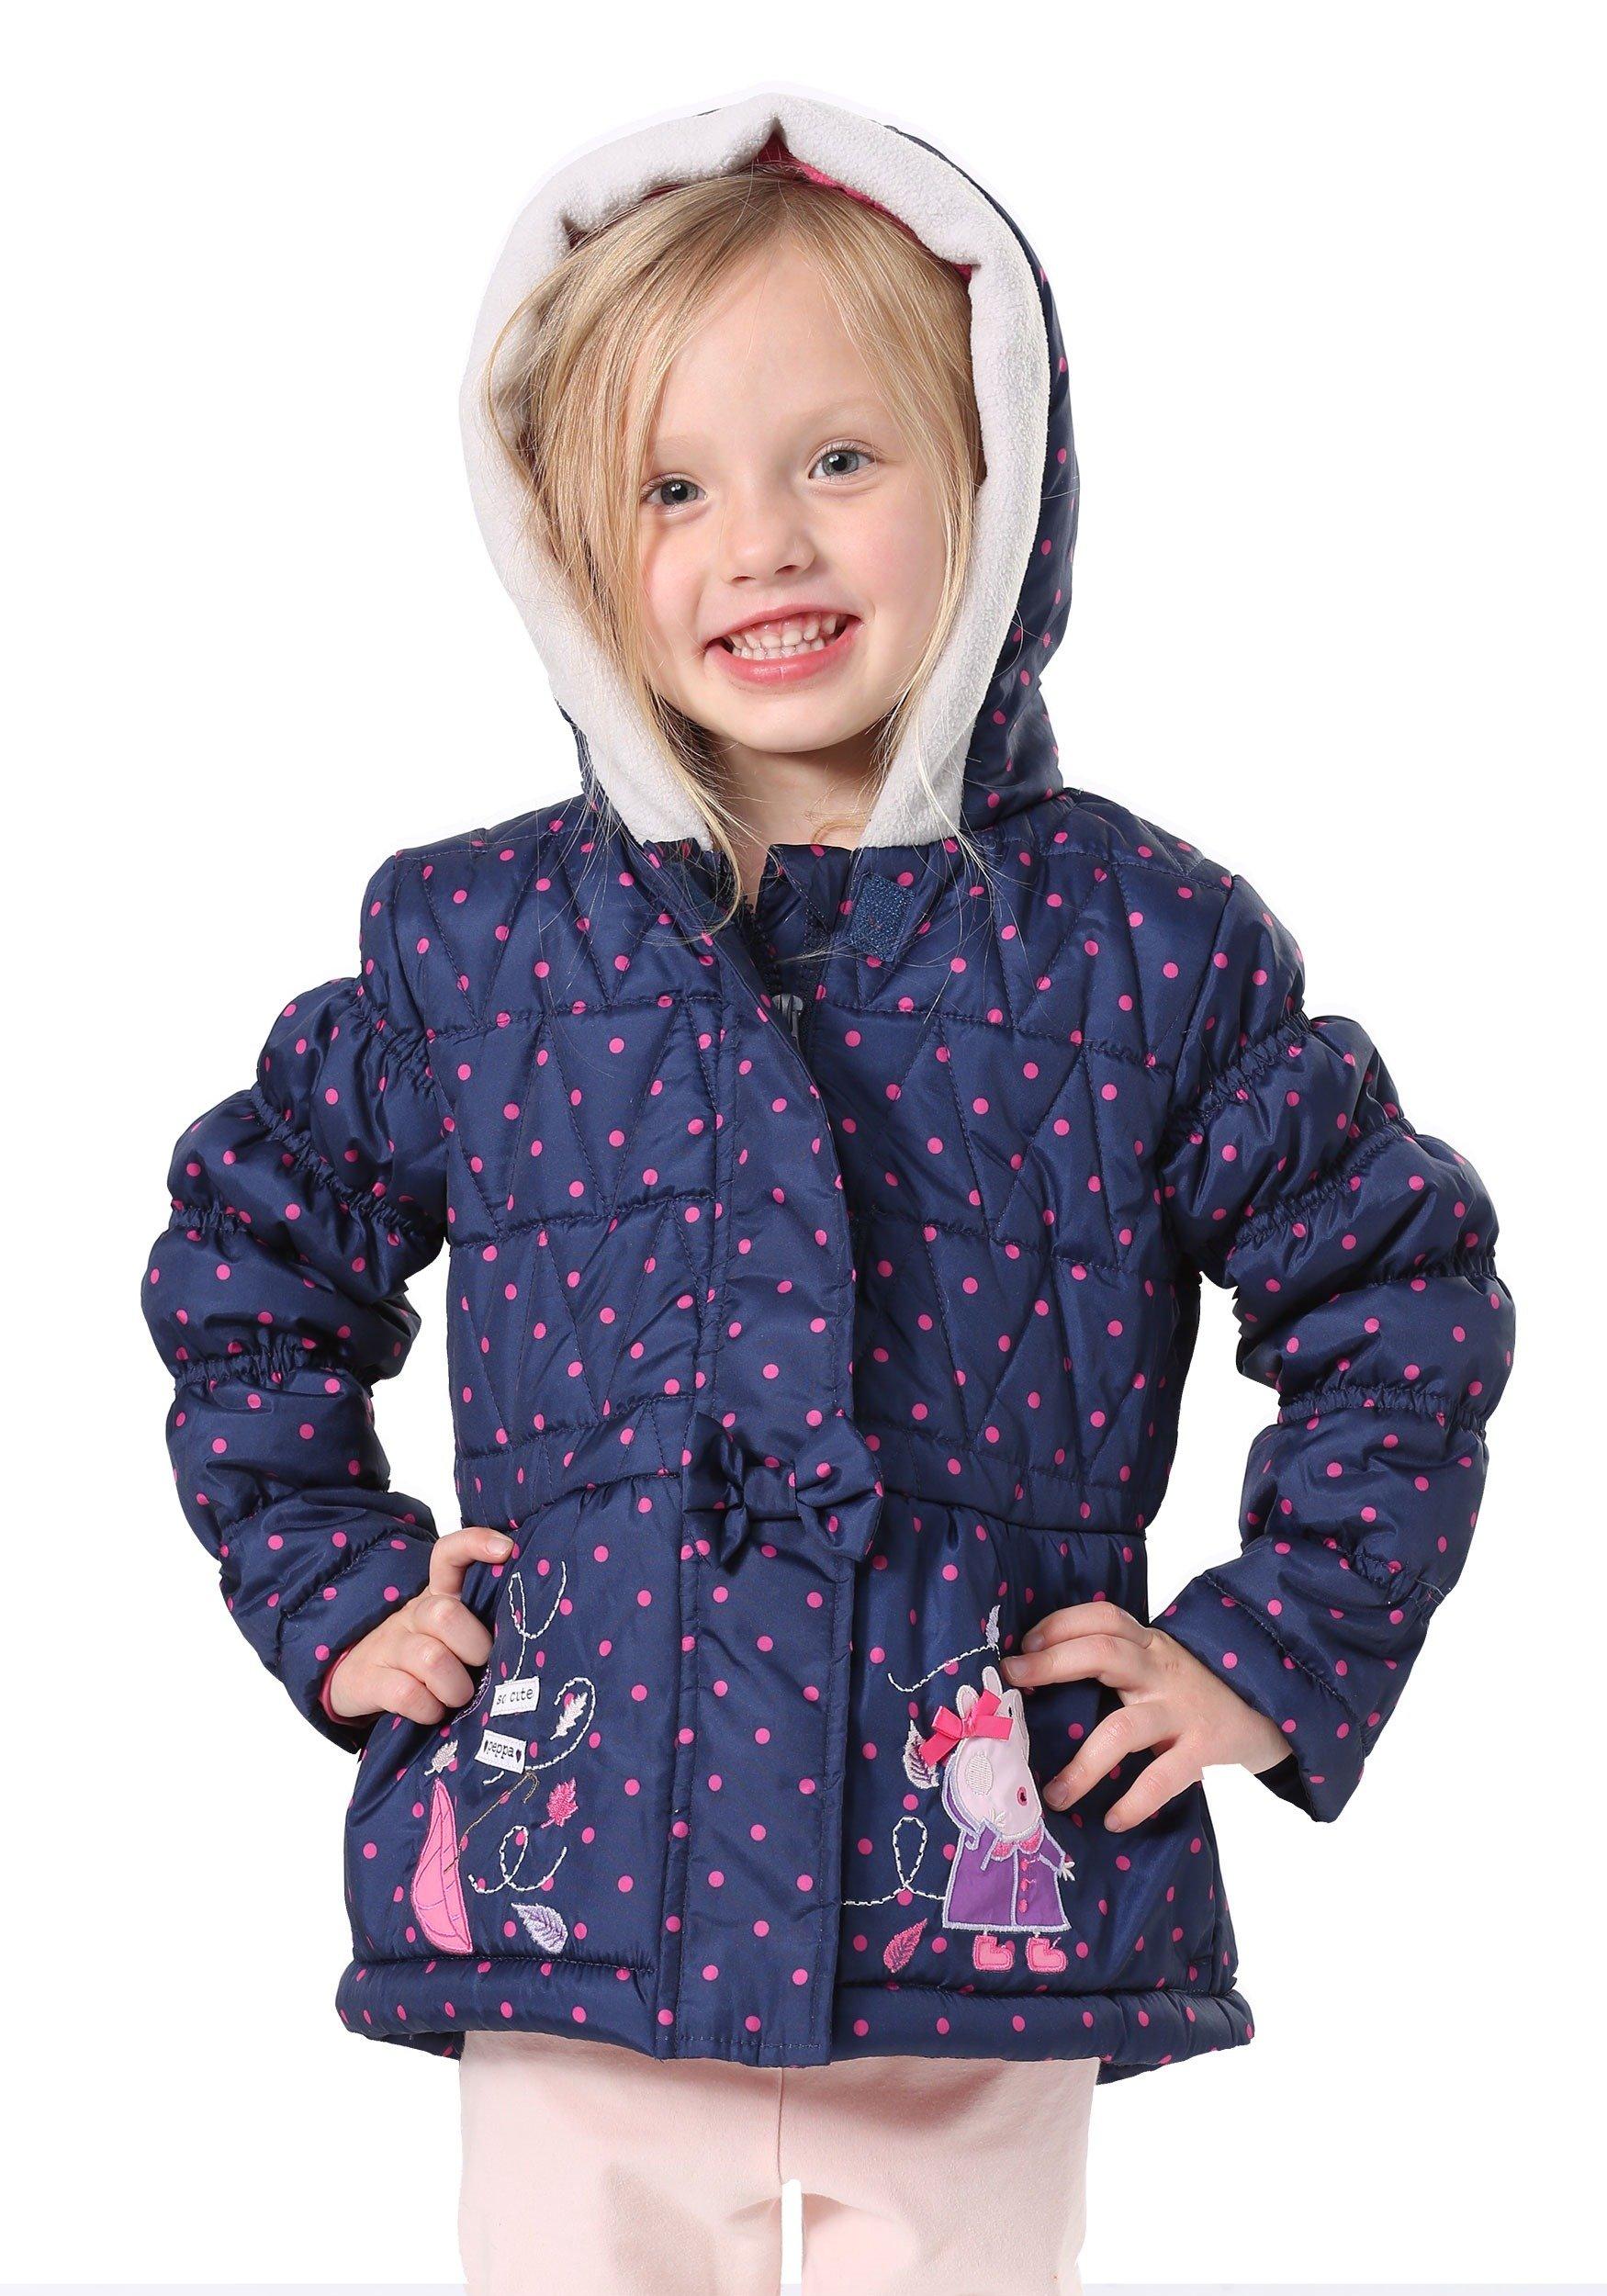 Peppa Pig Toddler Girls' Printed Polka Dot Puffer Coat, Blue, 3T